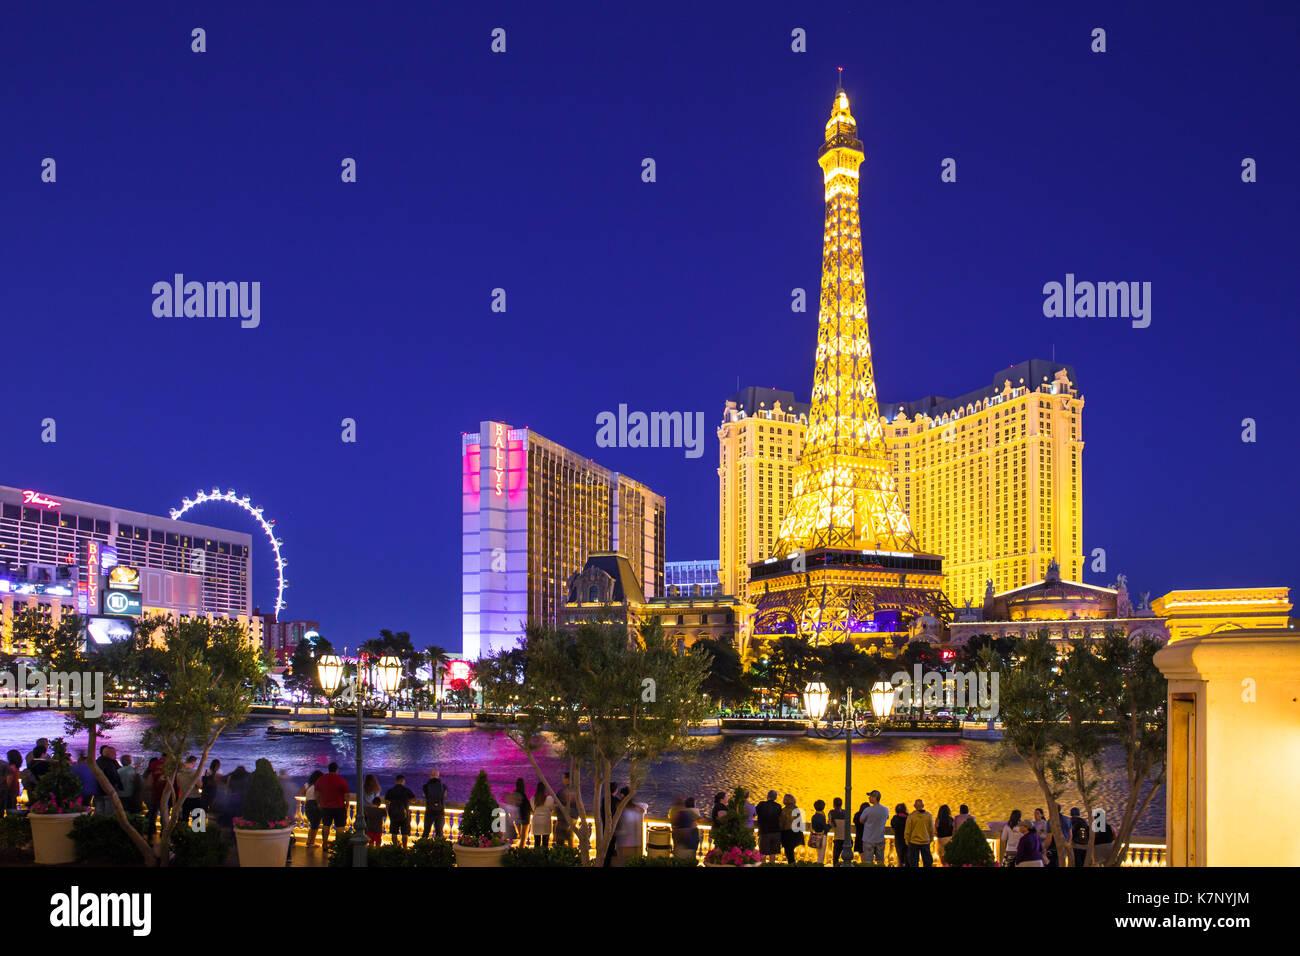 Las Vegas Nevada Mai 17 2017 Schone Nacht Blick Auf Den Las